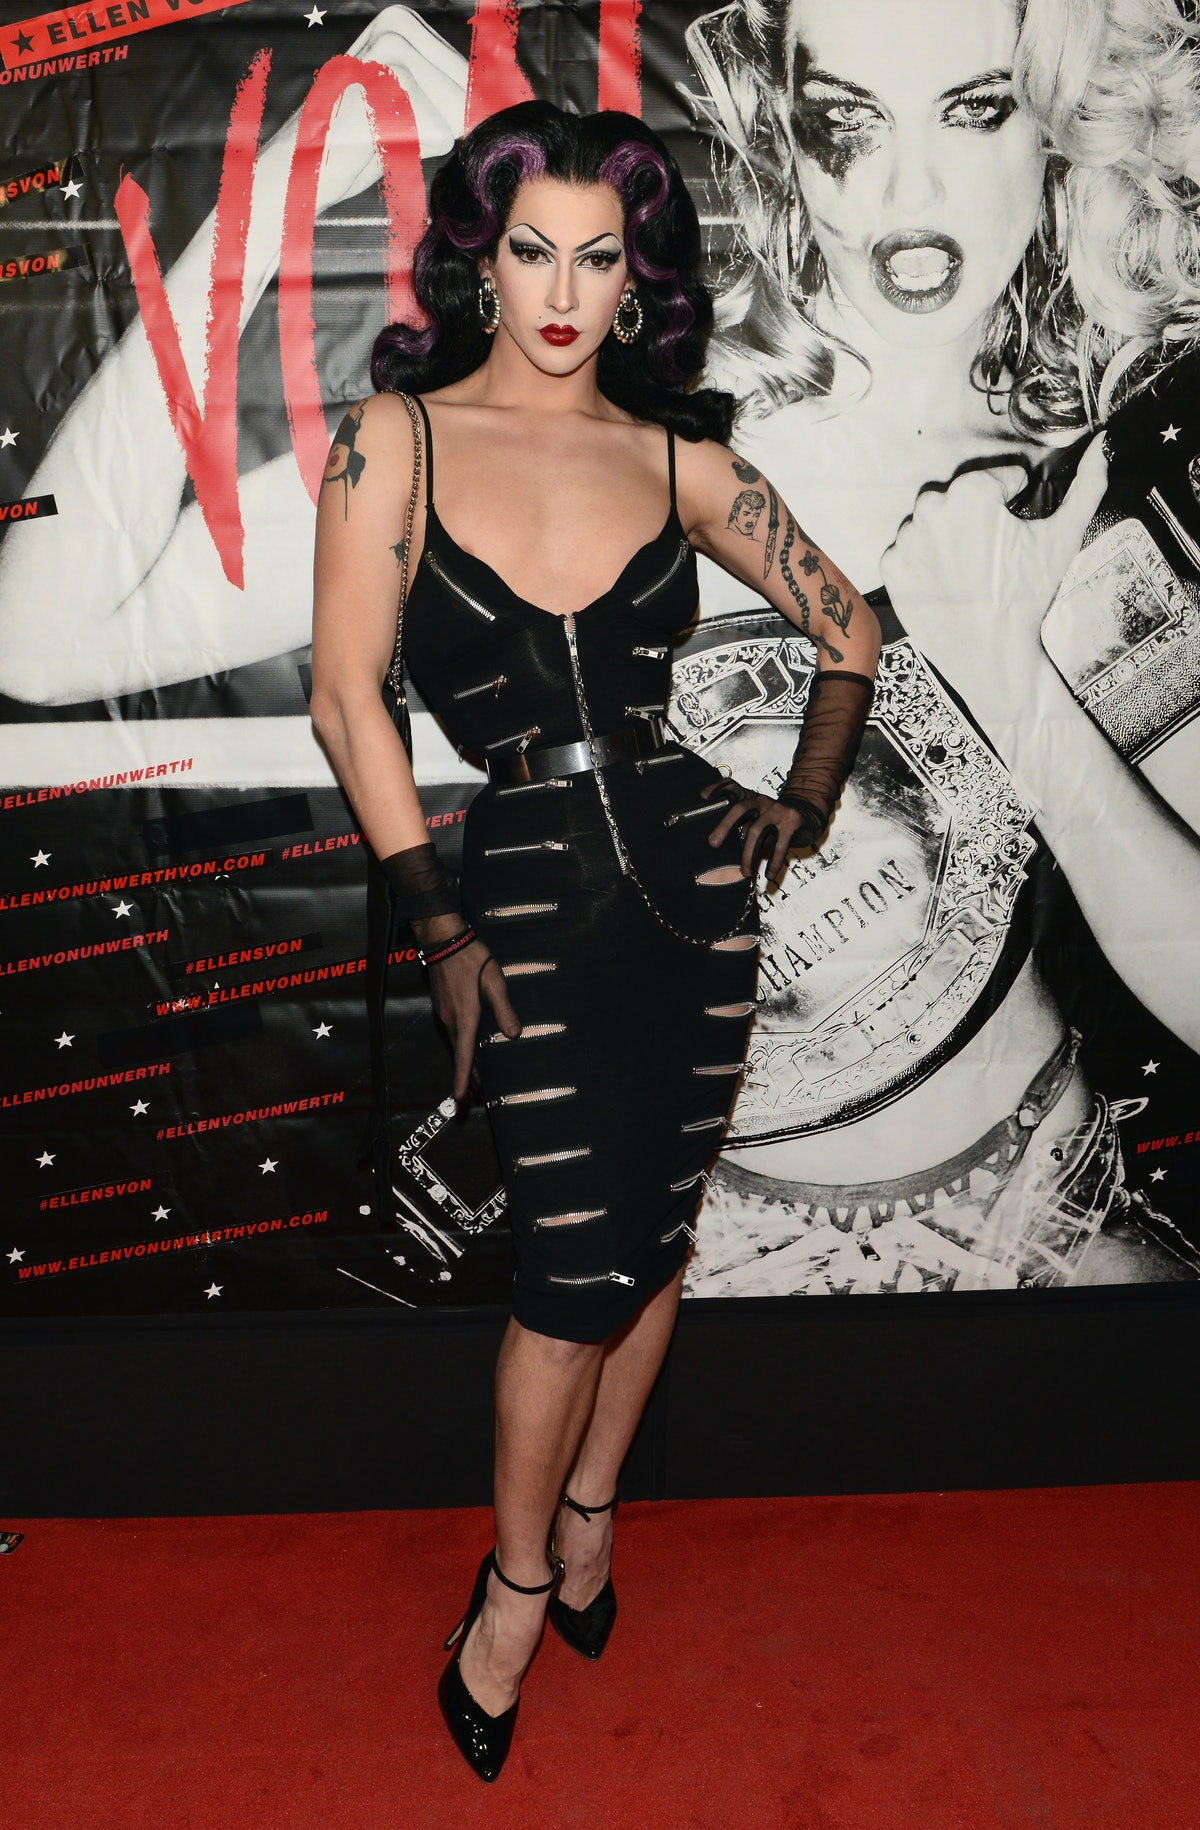 Violet Chachki on red carpet.